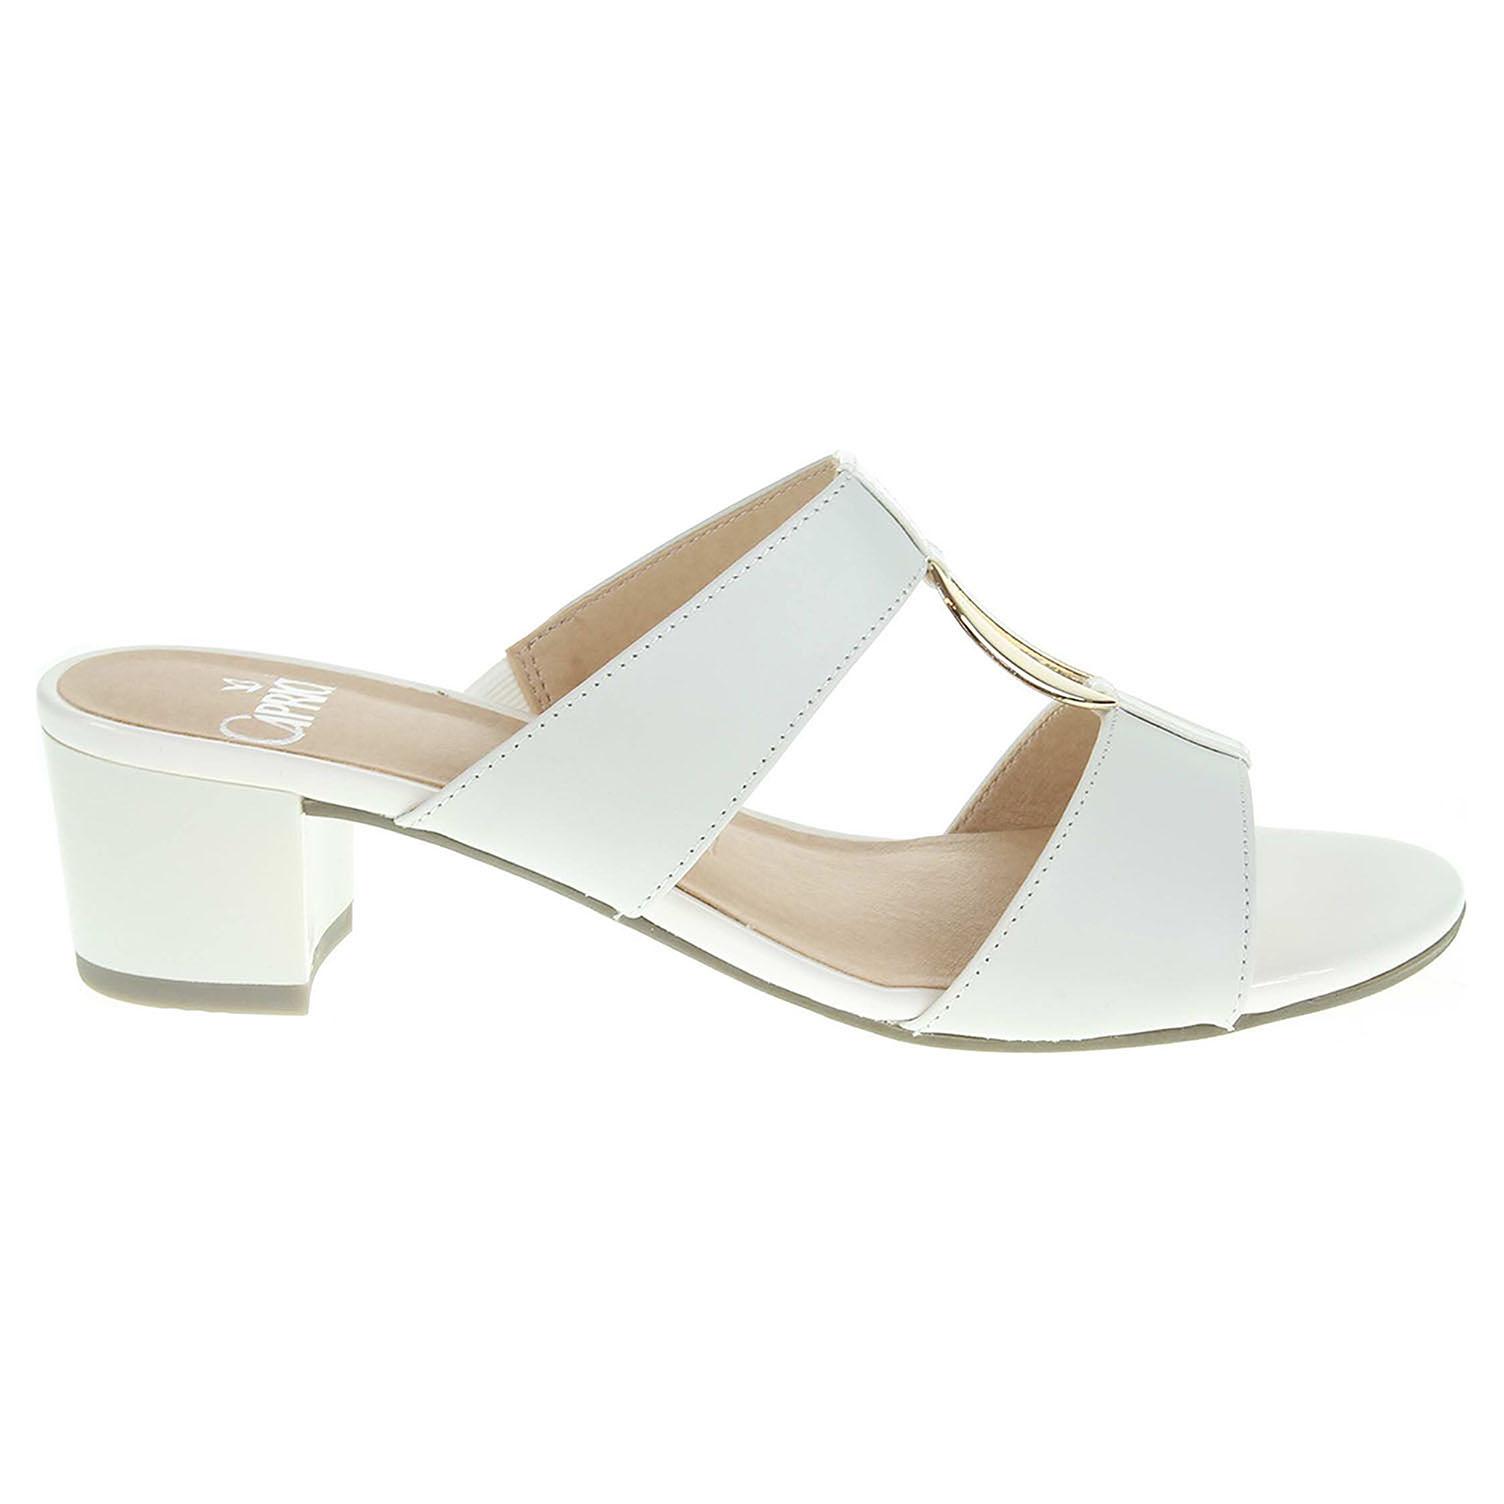 Ecco Caprice dámské pantofle 9-27210-28 bílé 23600797